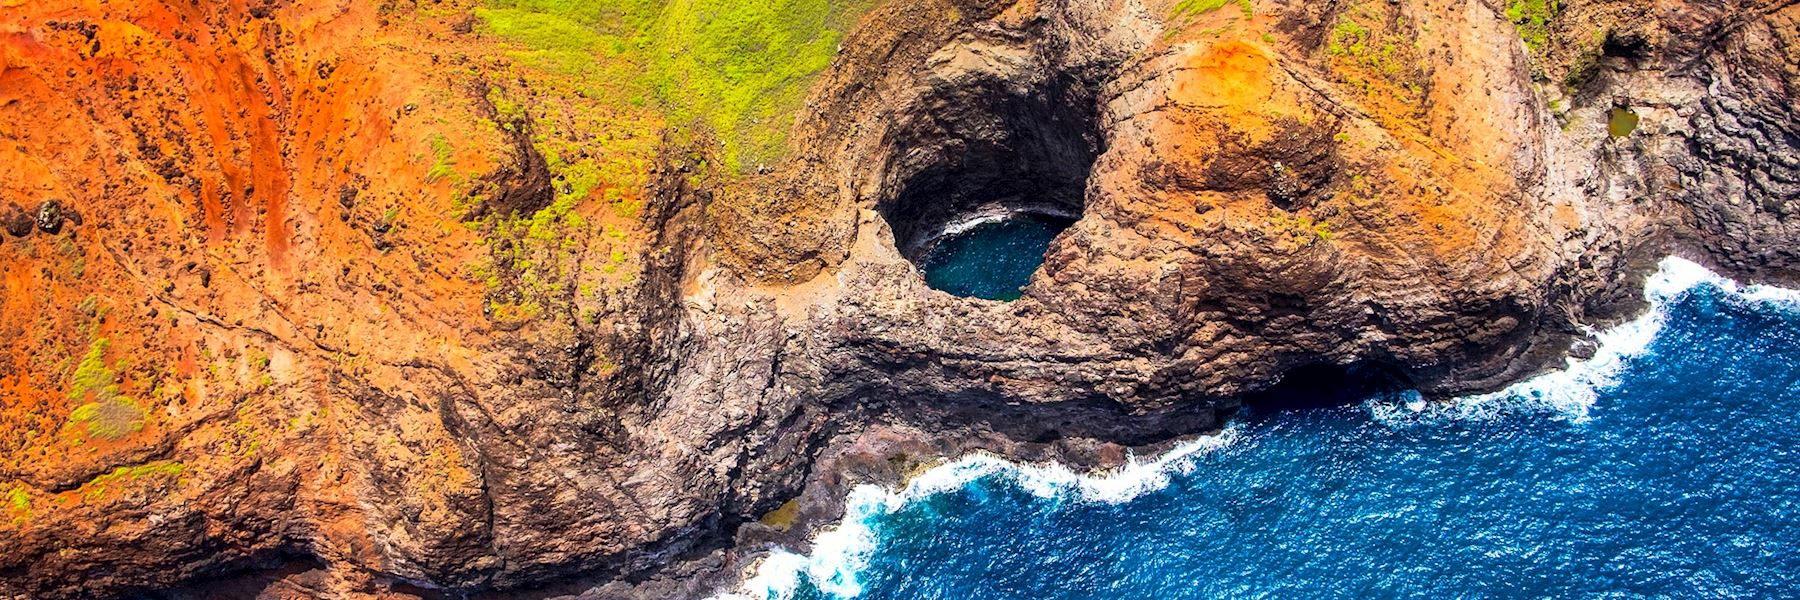 Hawaii trip ideas